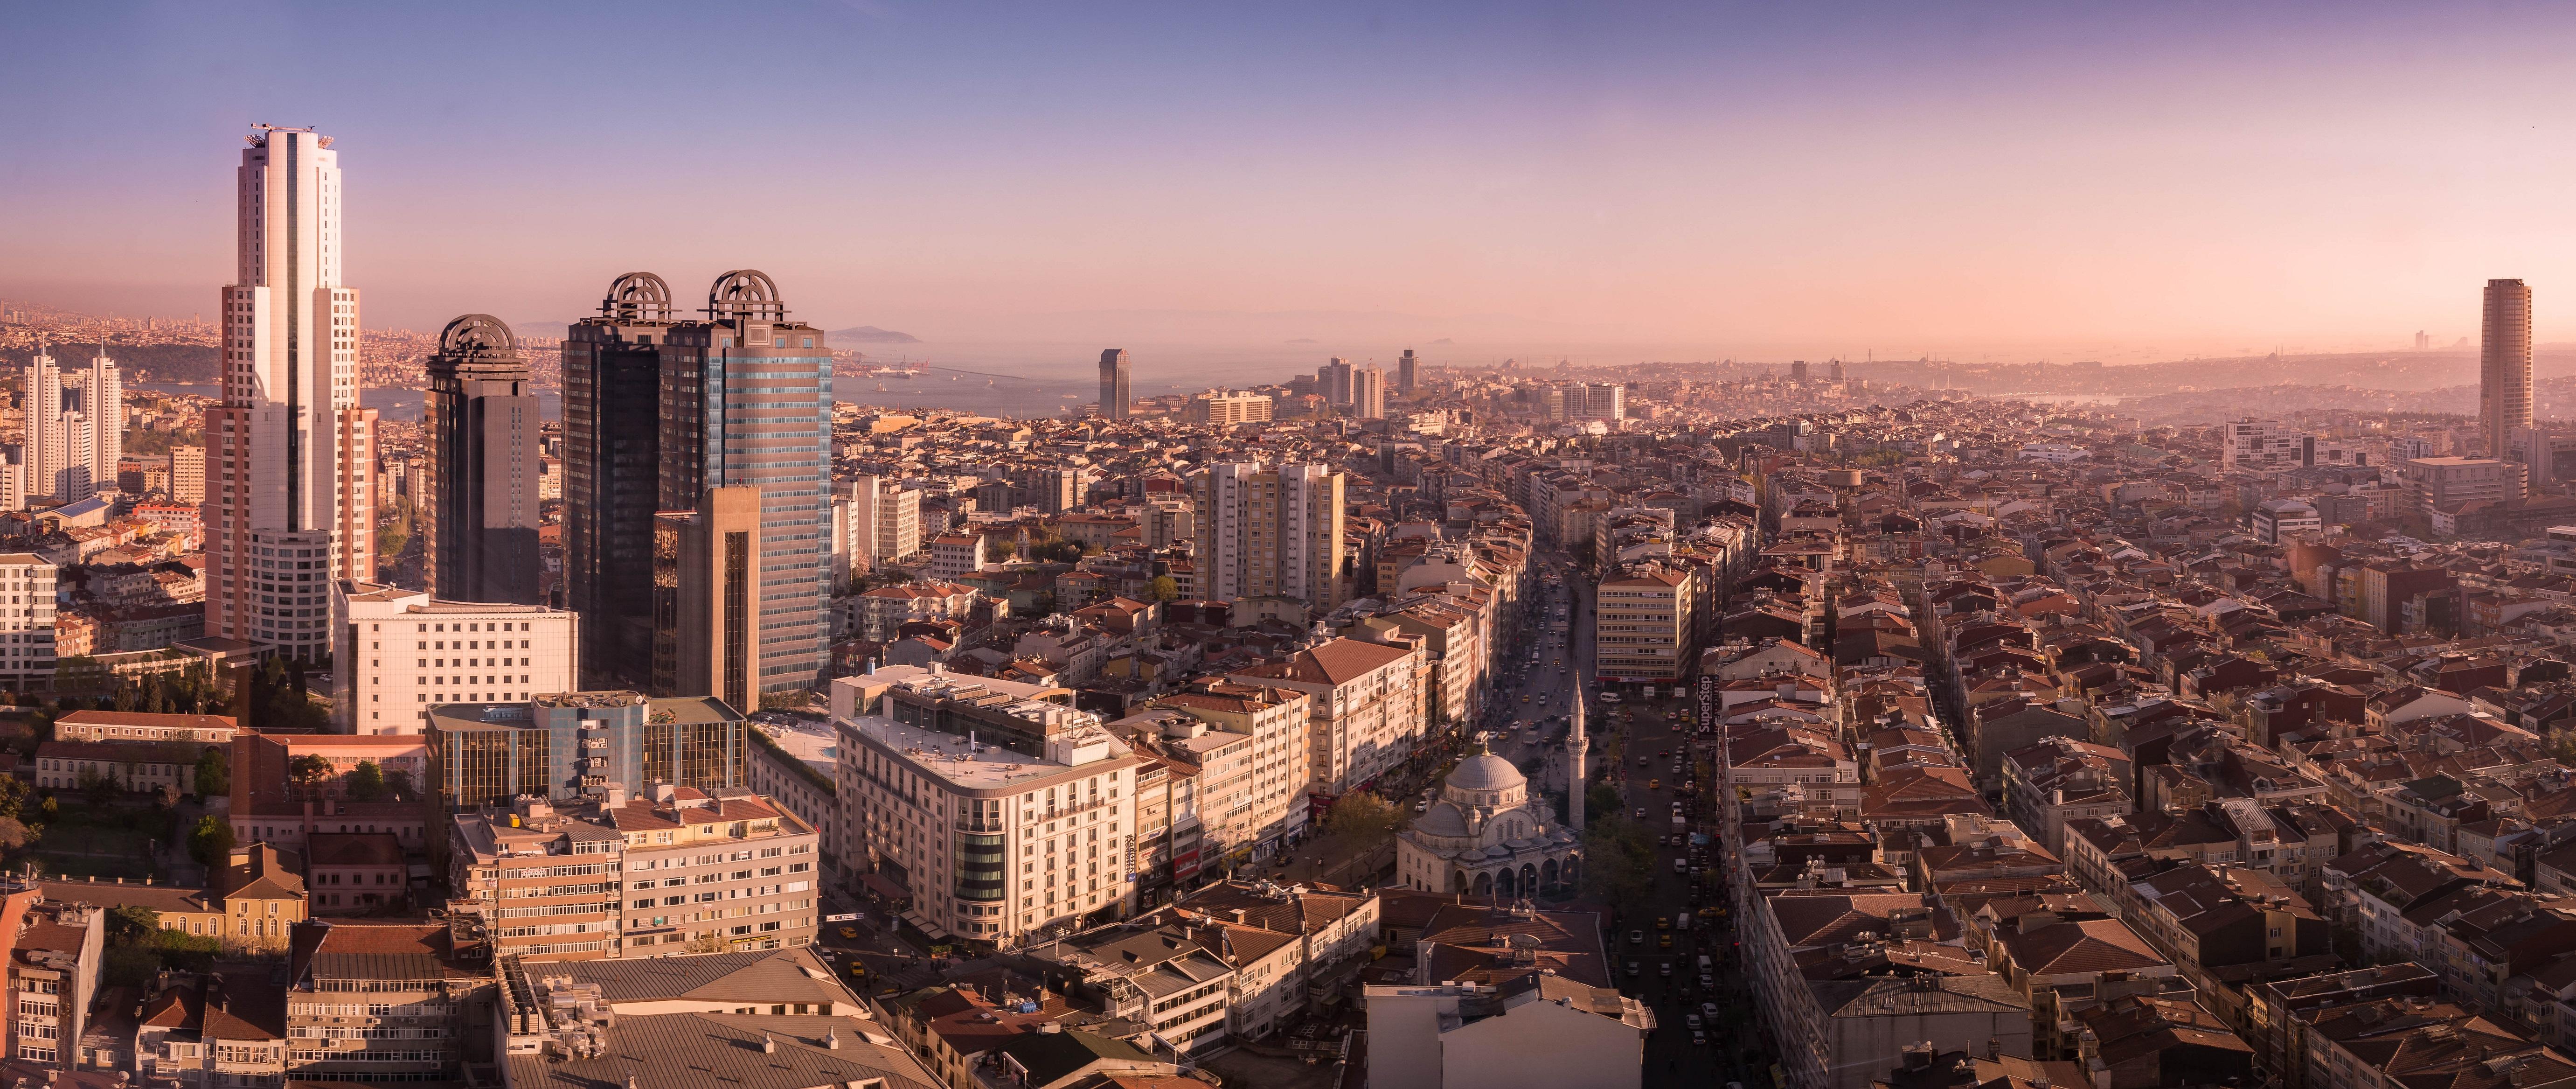 Istanbul Turkey 4k Ultra Fondo De Pantalla Hd Fondo De